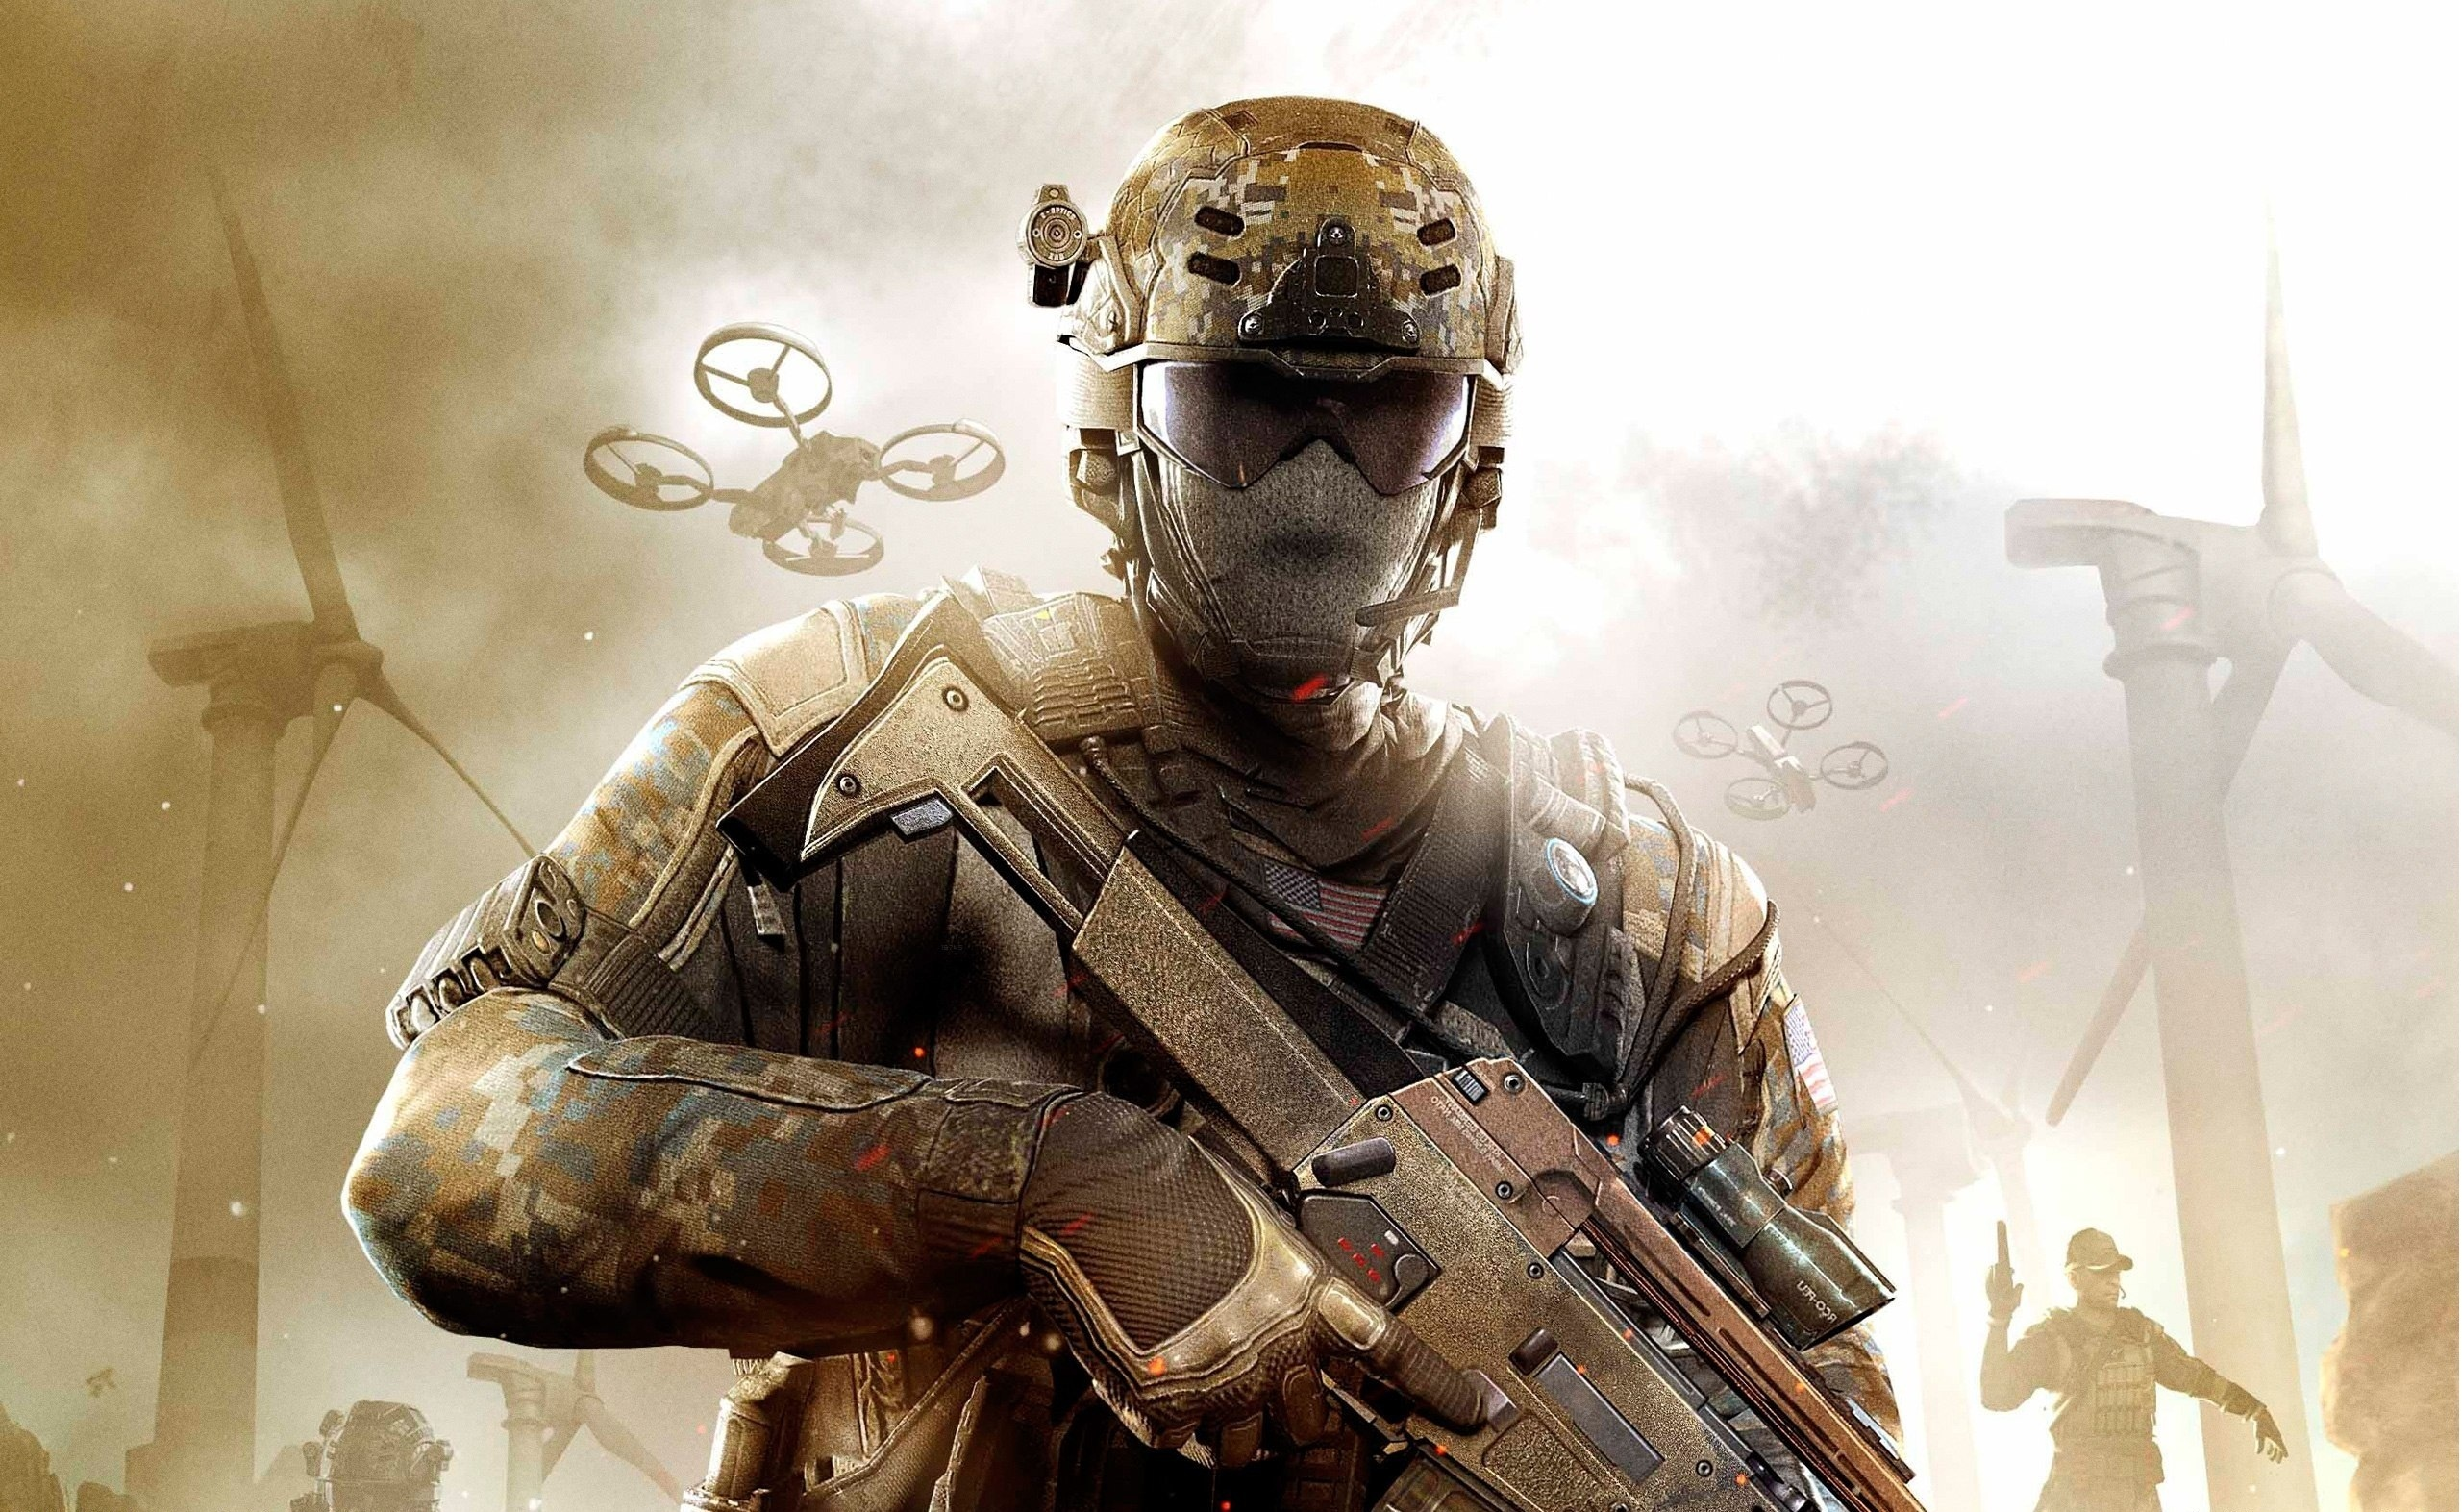 Wallpapers Desktops   Call Of Duty 2561x1573